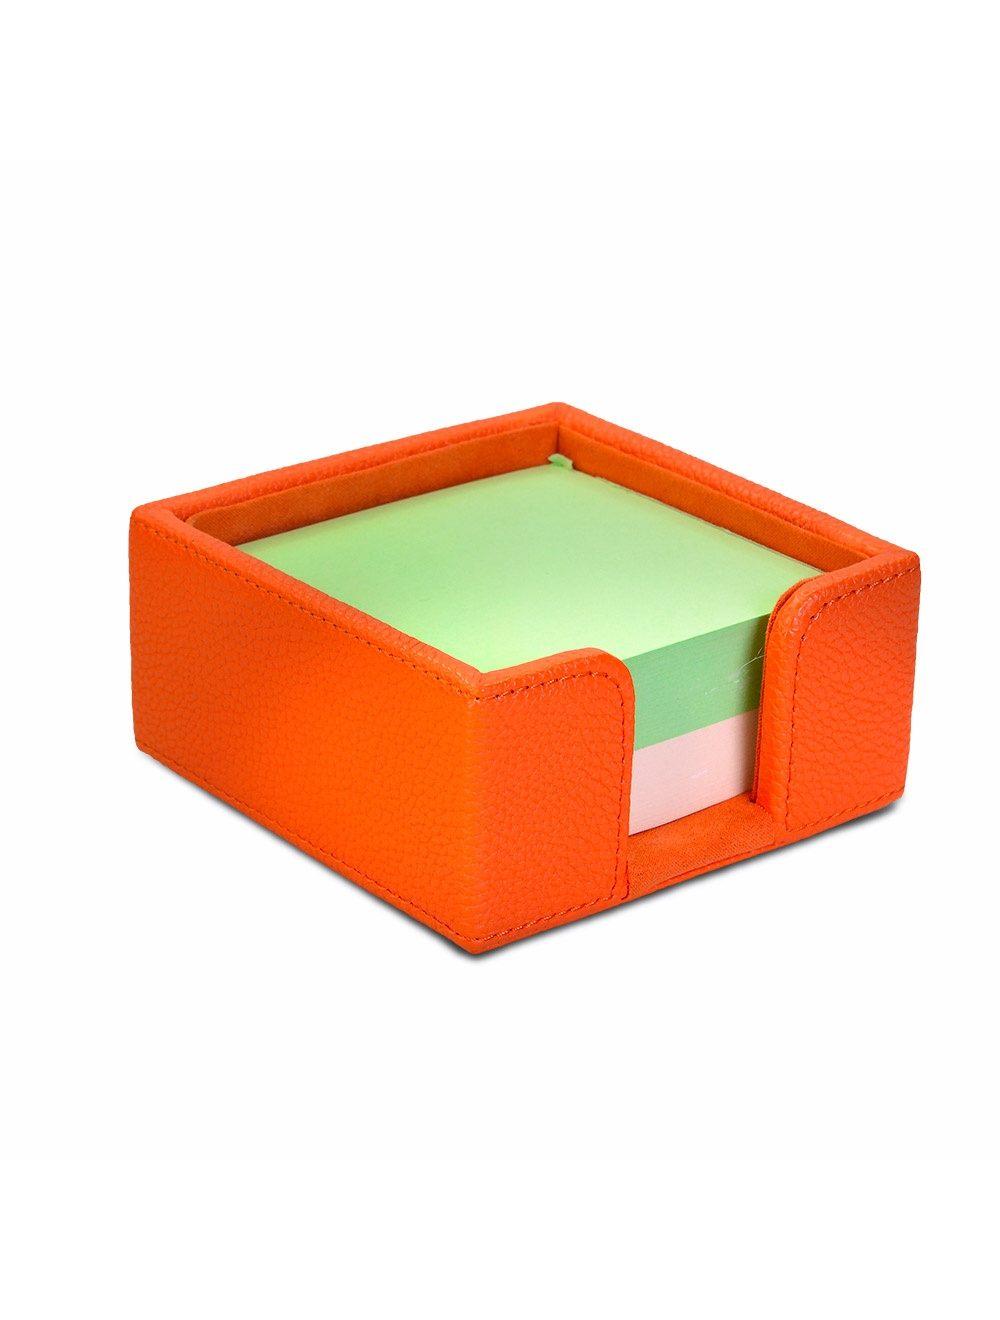 Memo Card Holder - Mandarin